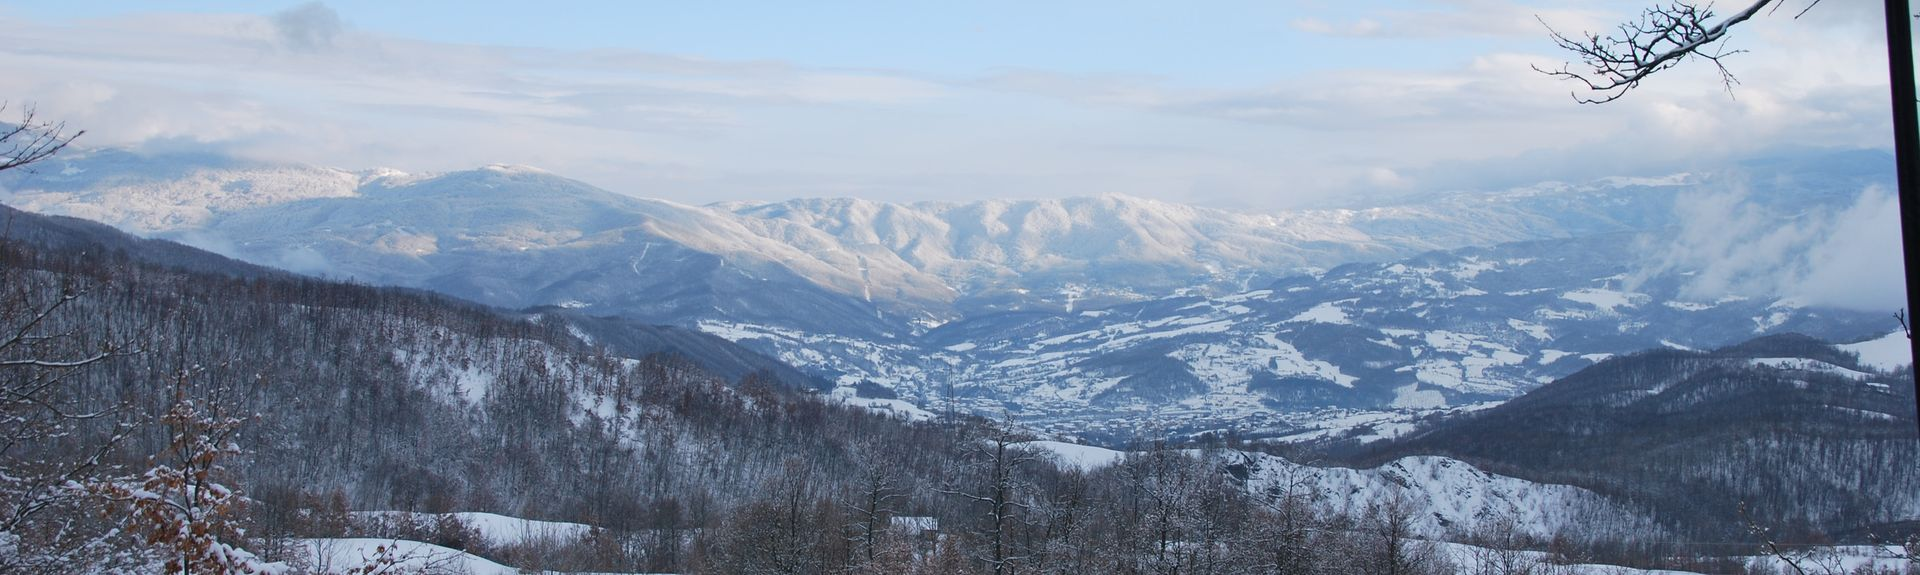 Farini, Emilia-Romagna, Italië